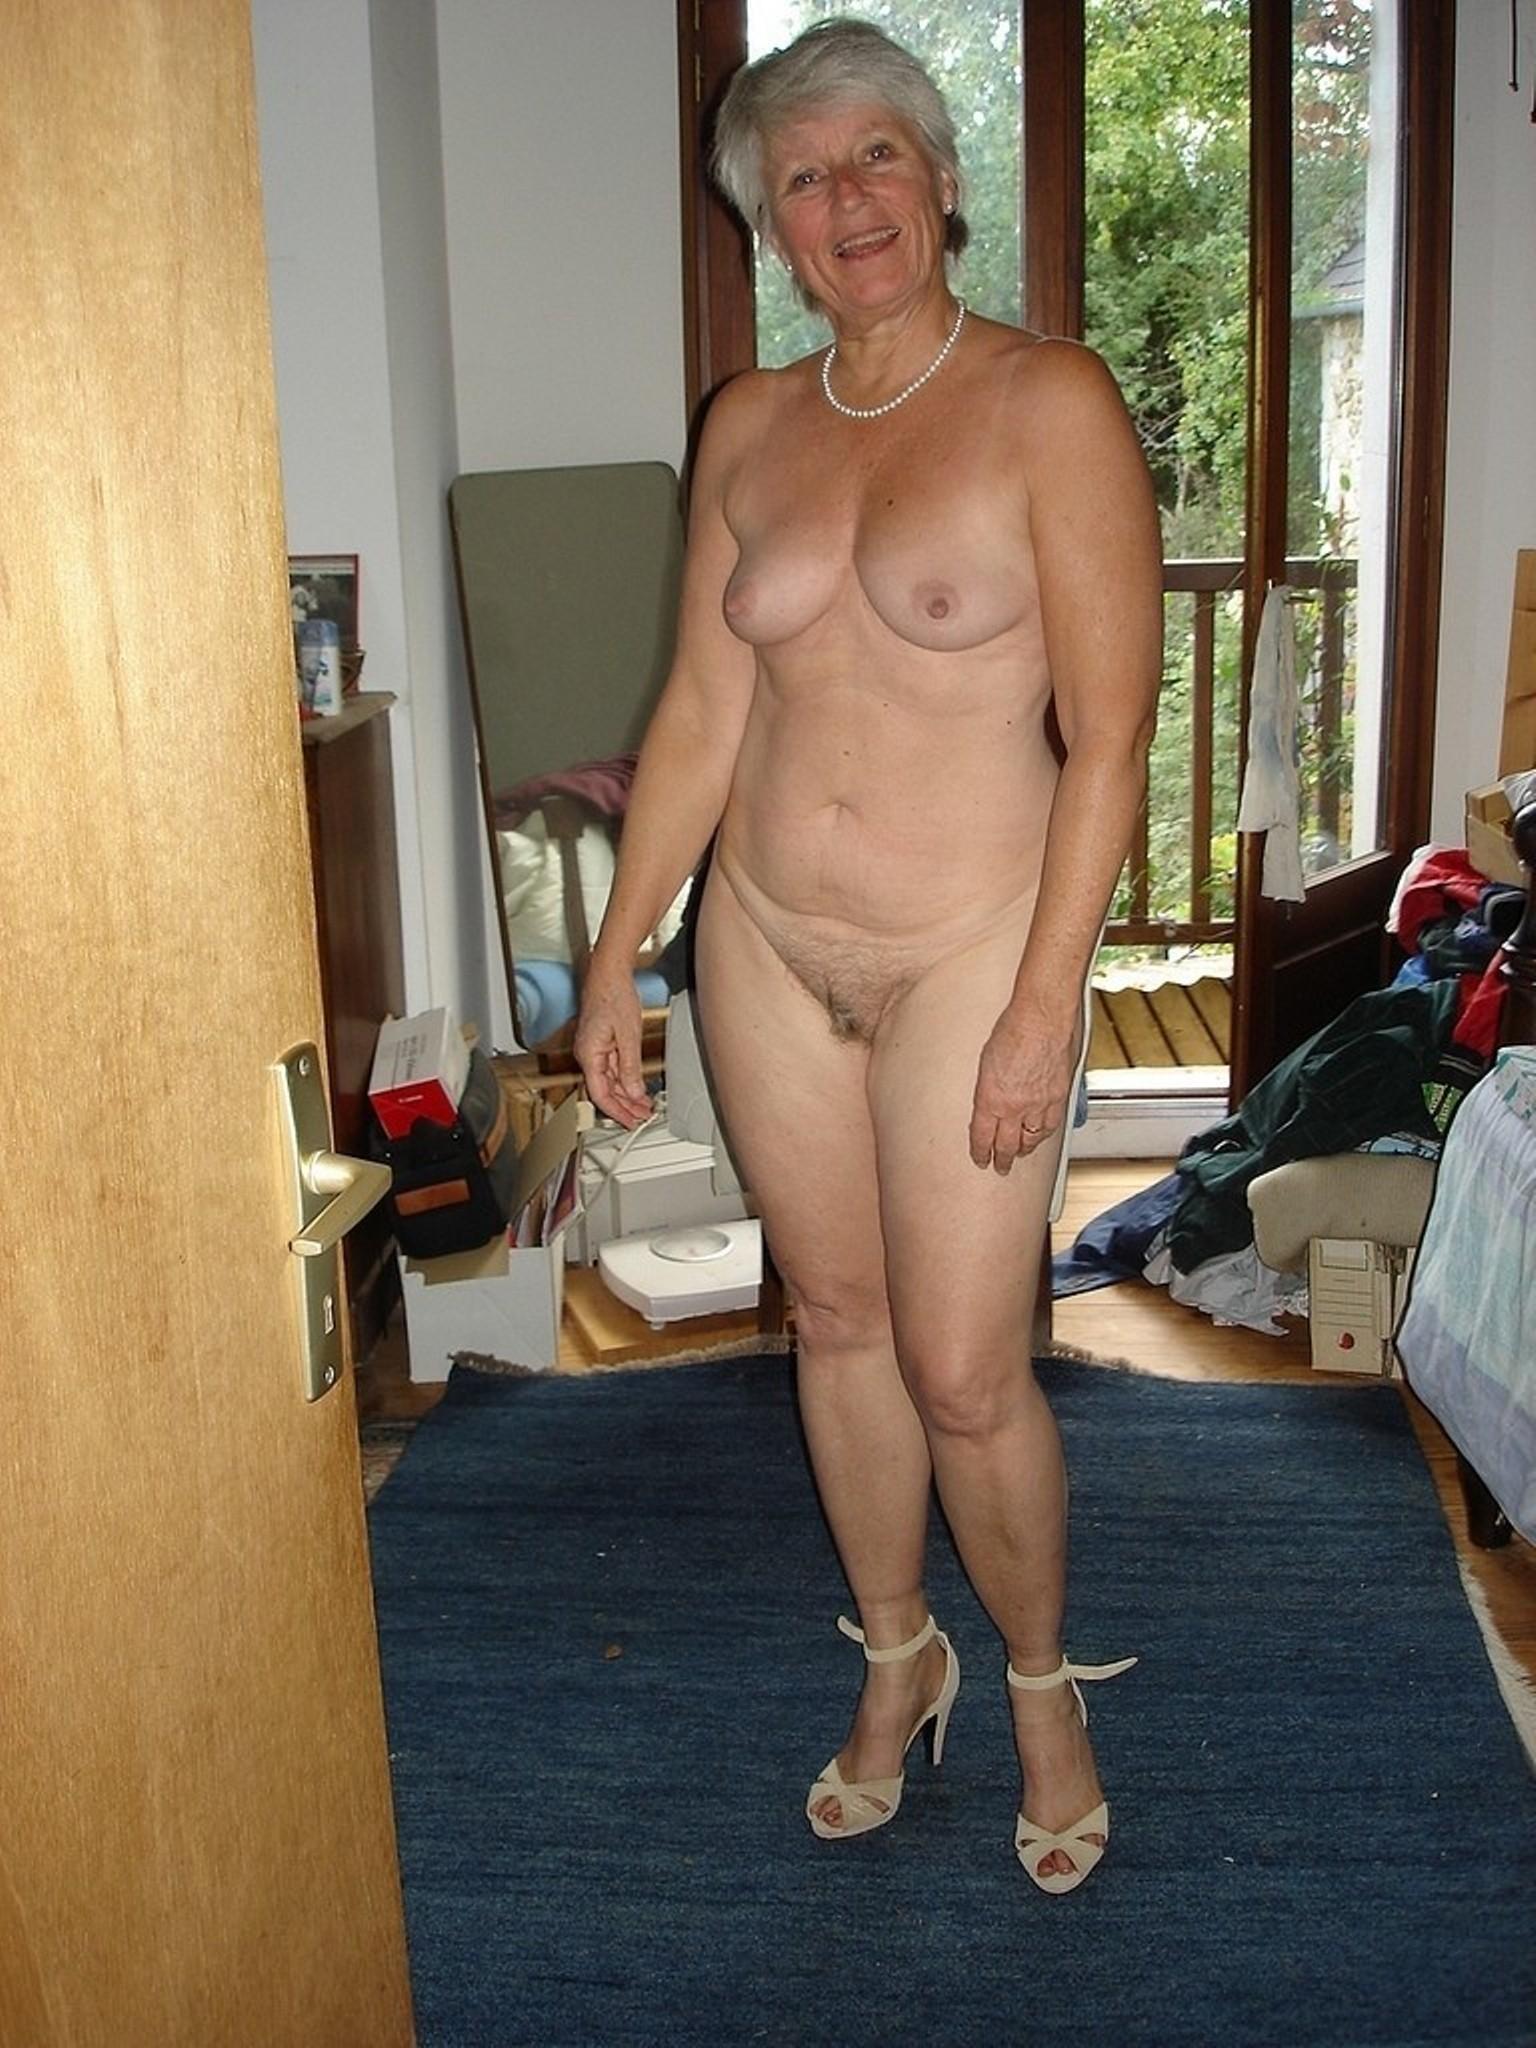 I Love natural tits